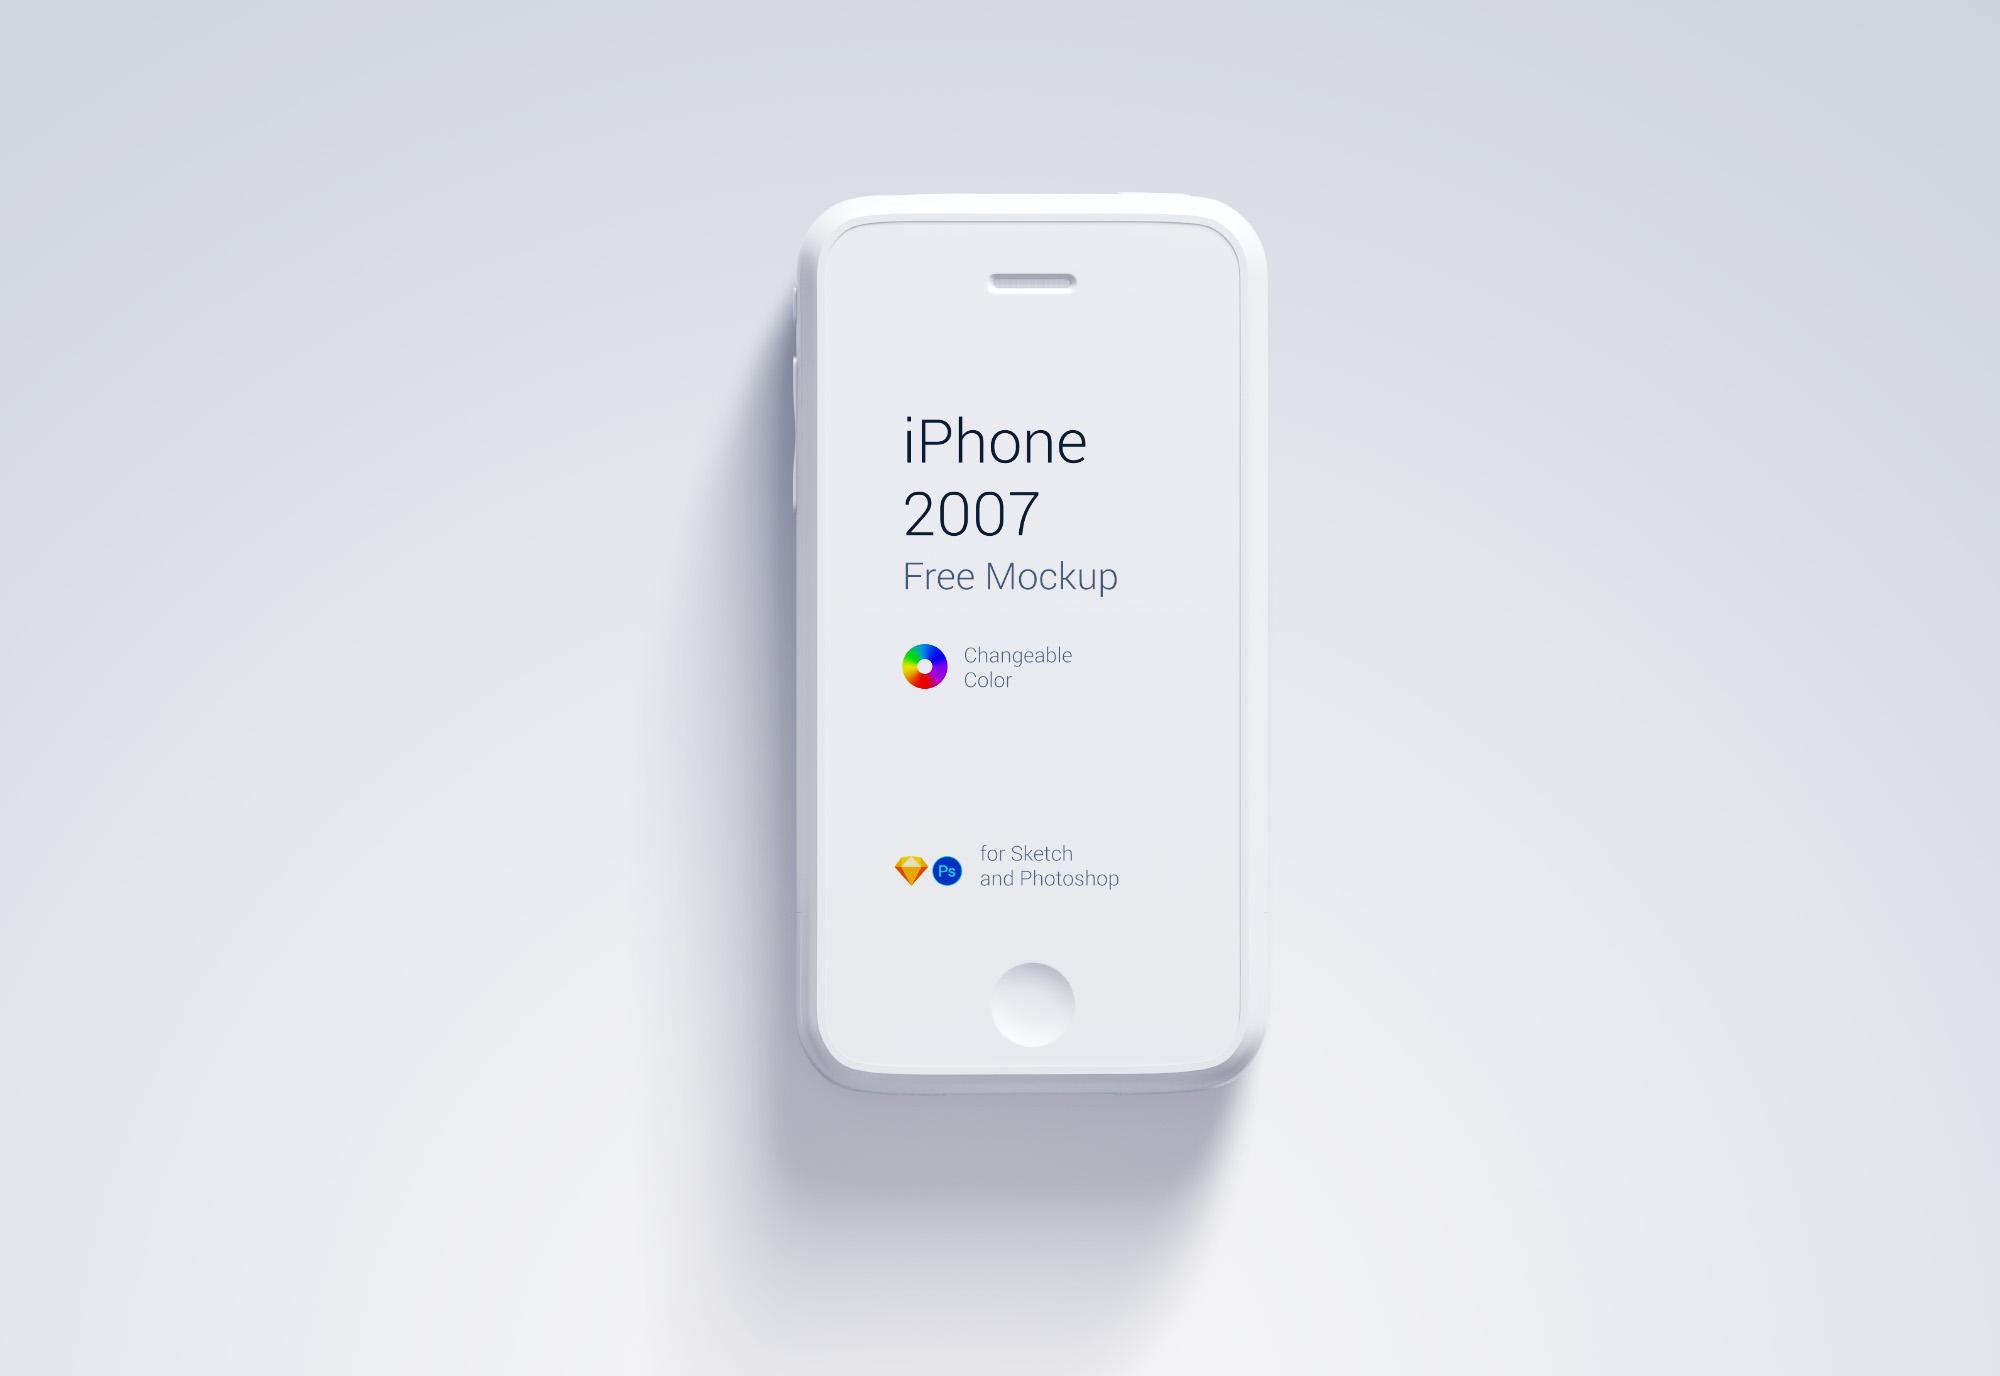 iPhone 1st Generation Mockup